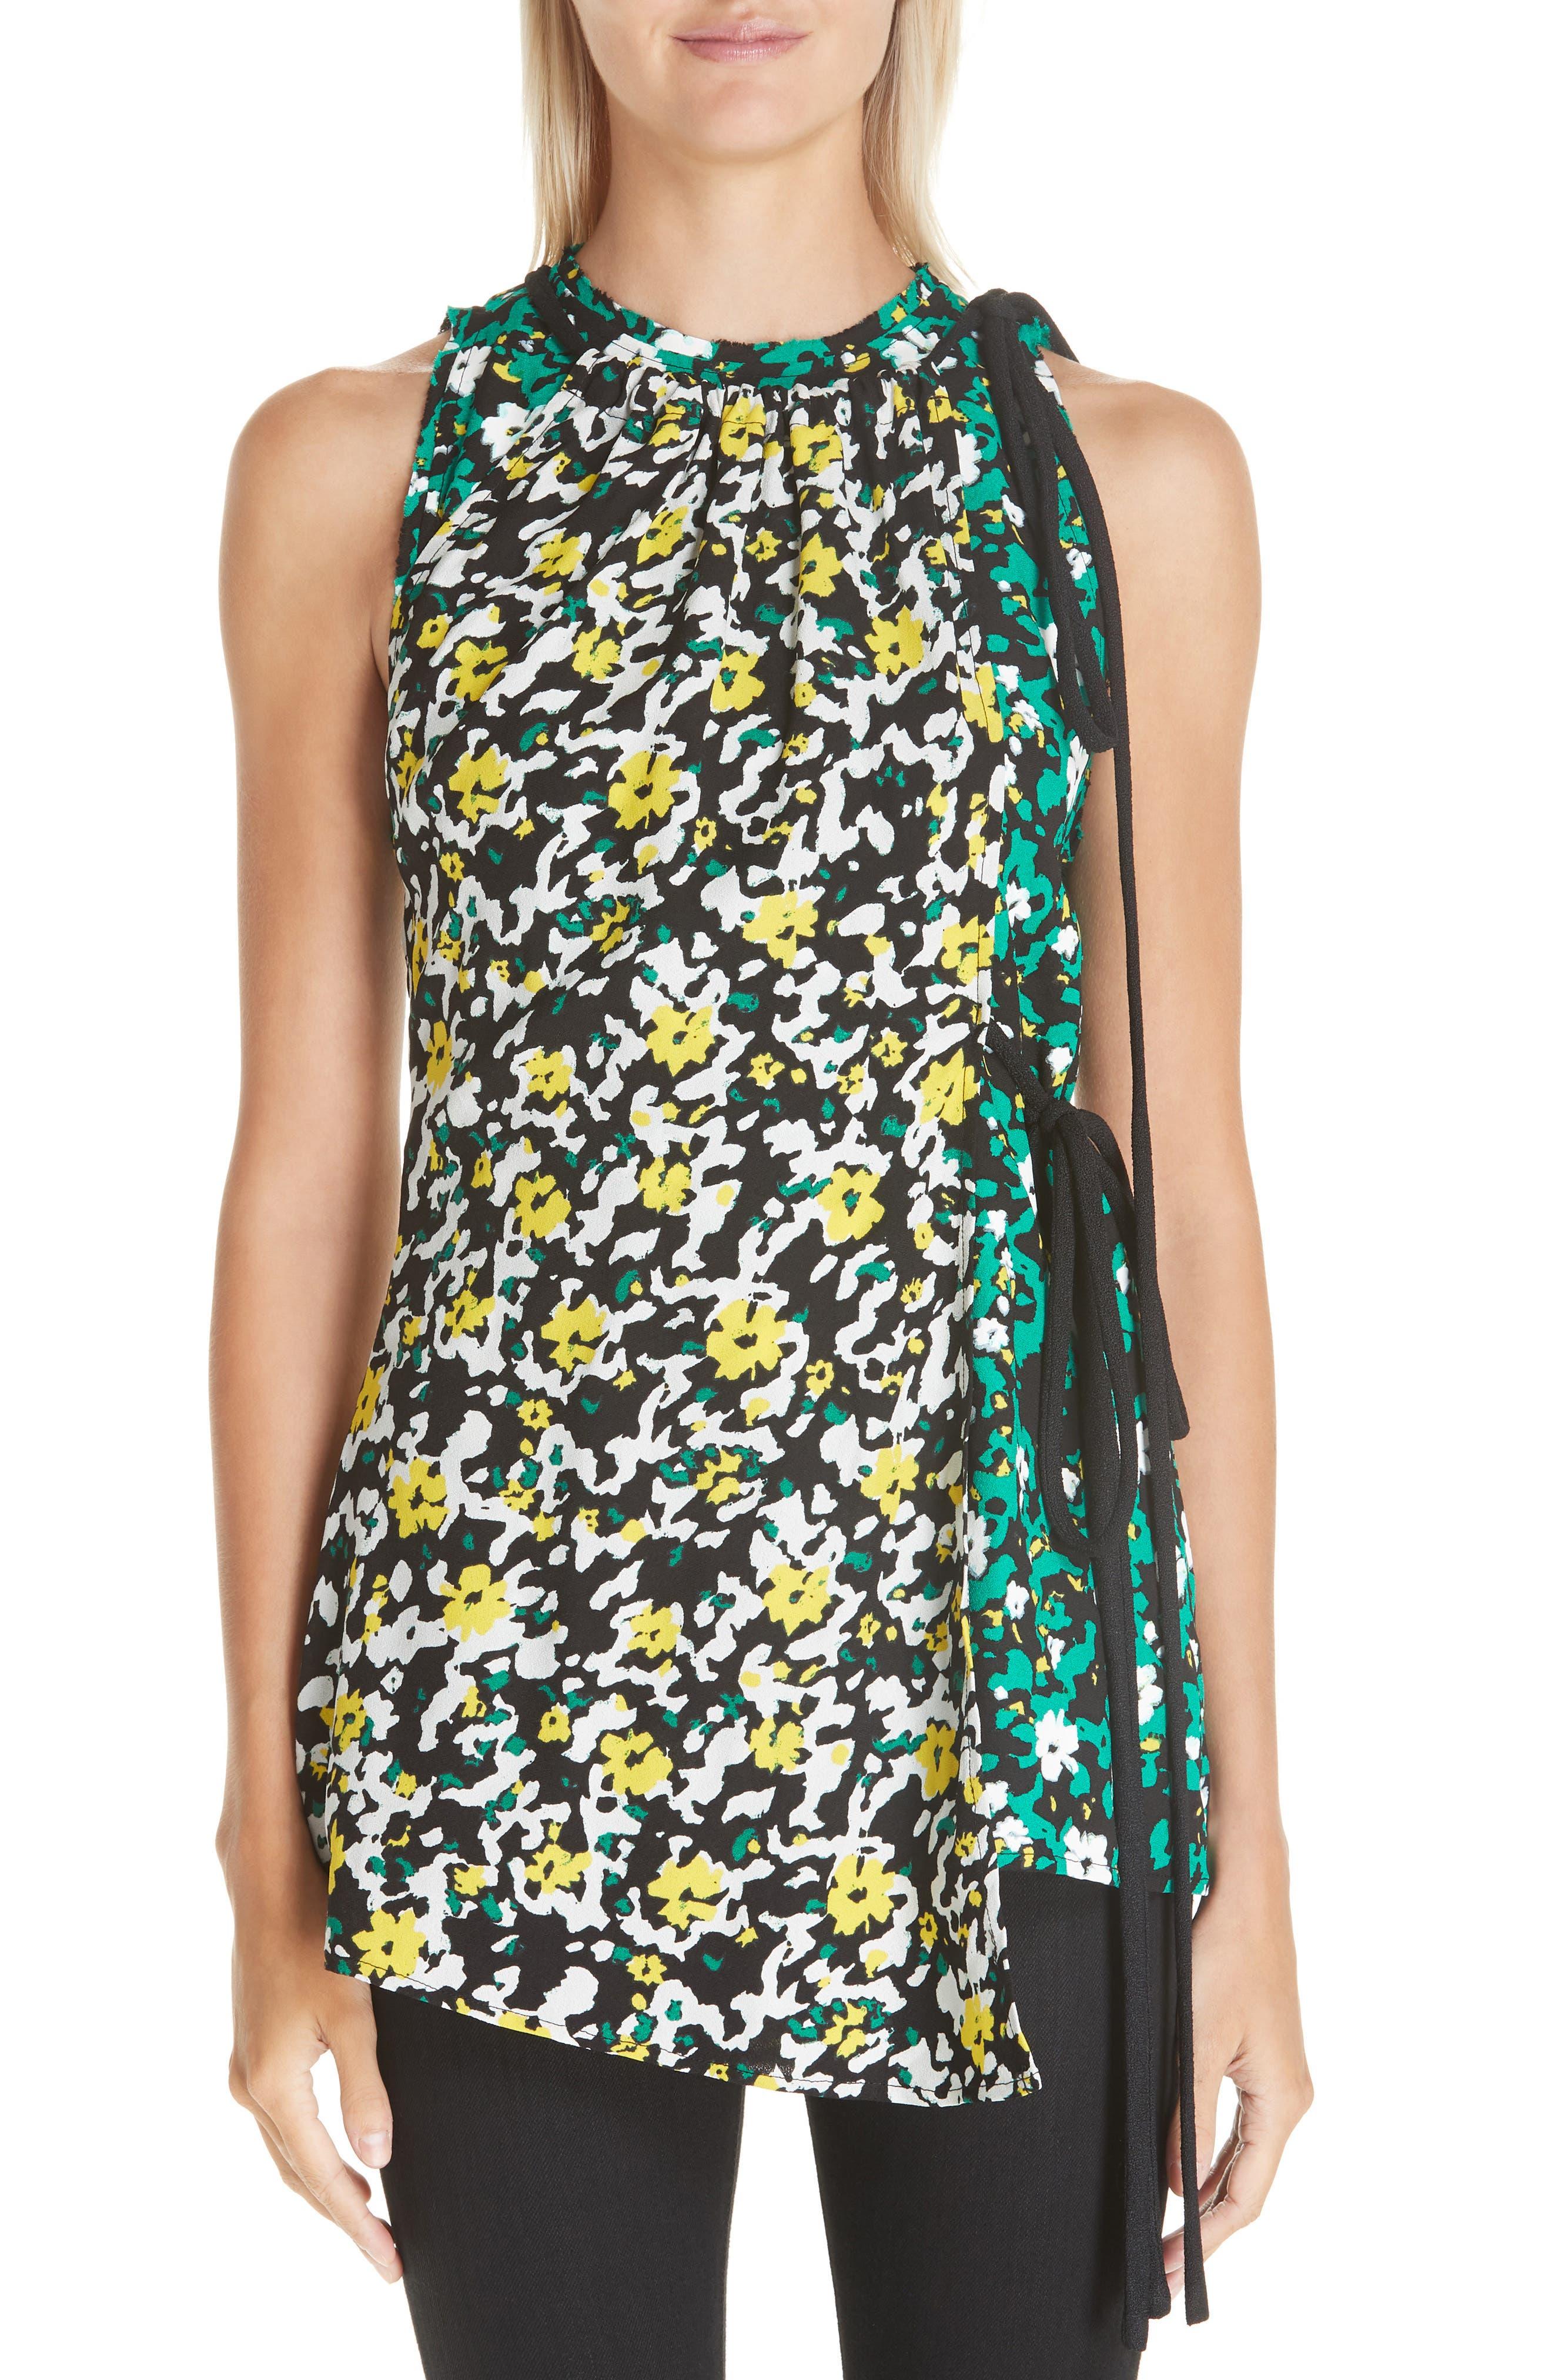 PROENZA SCHOULER, Side Tie Floral Print Blouse, Main thumbnail 1, color, WHITE WILDFLOWER